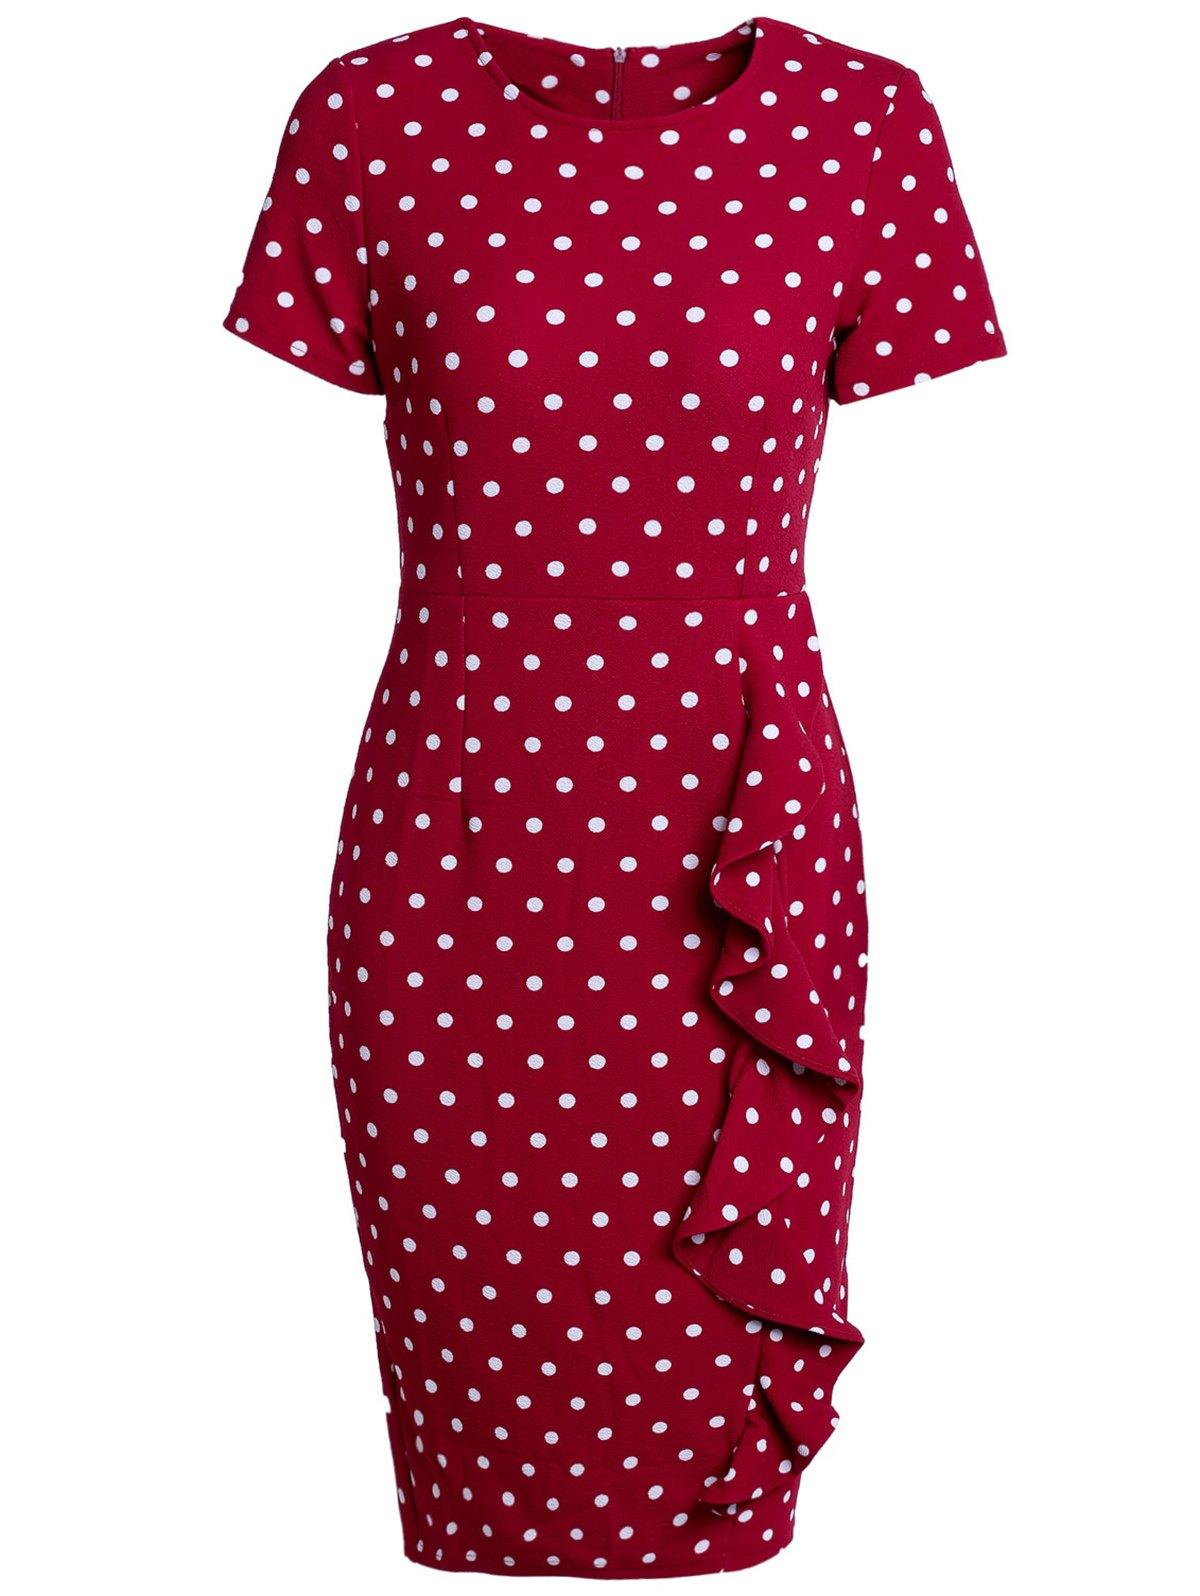 Short Sleeves Polka Dot Back Slit Pencil Dress